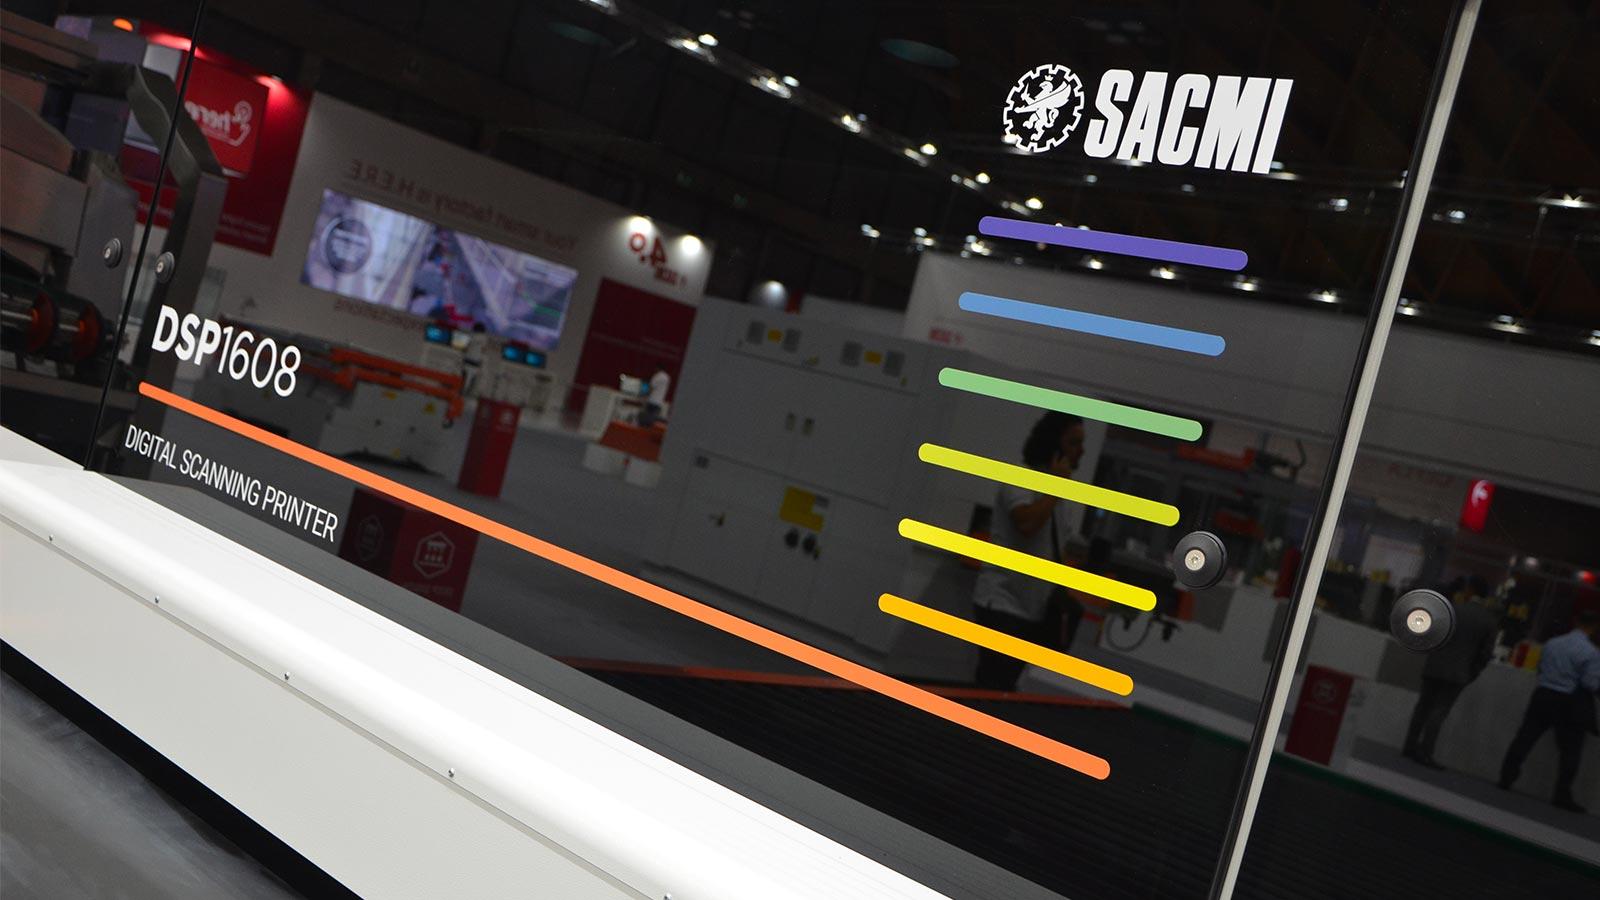 sacmi-macchine-digitali-2018-dsp1608